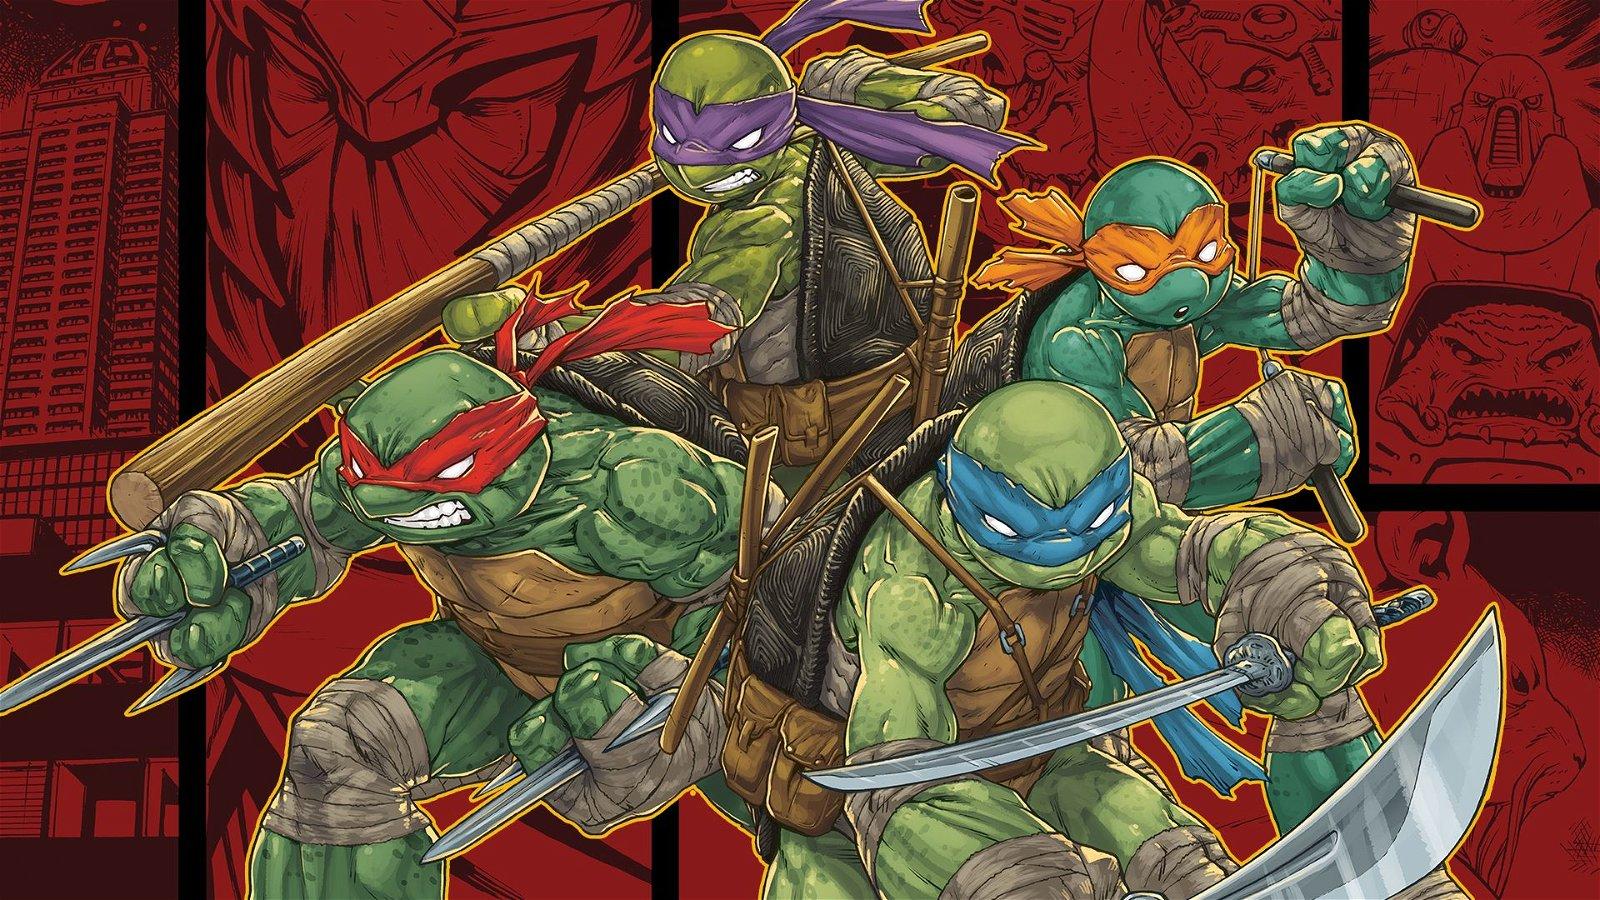 Teenage Mutant Ninja Turtles: Mutants in Manhattan (PS4) Review 9